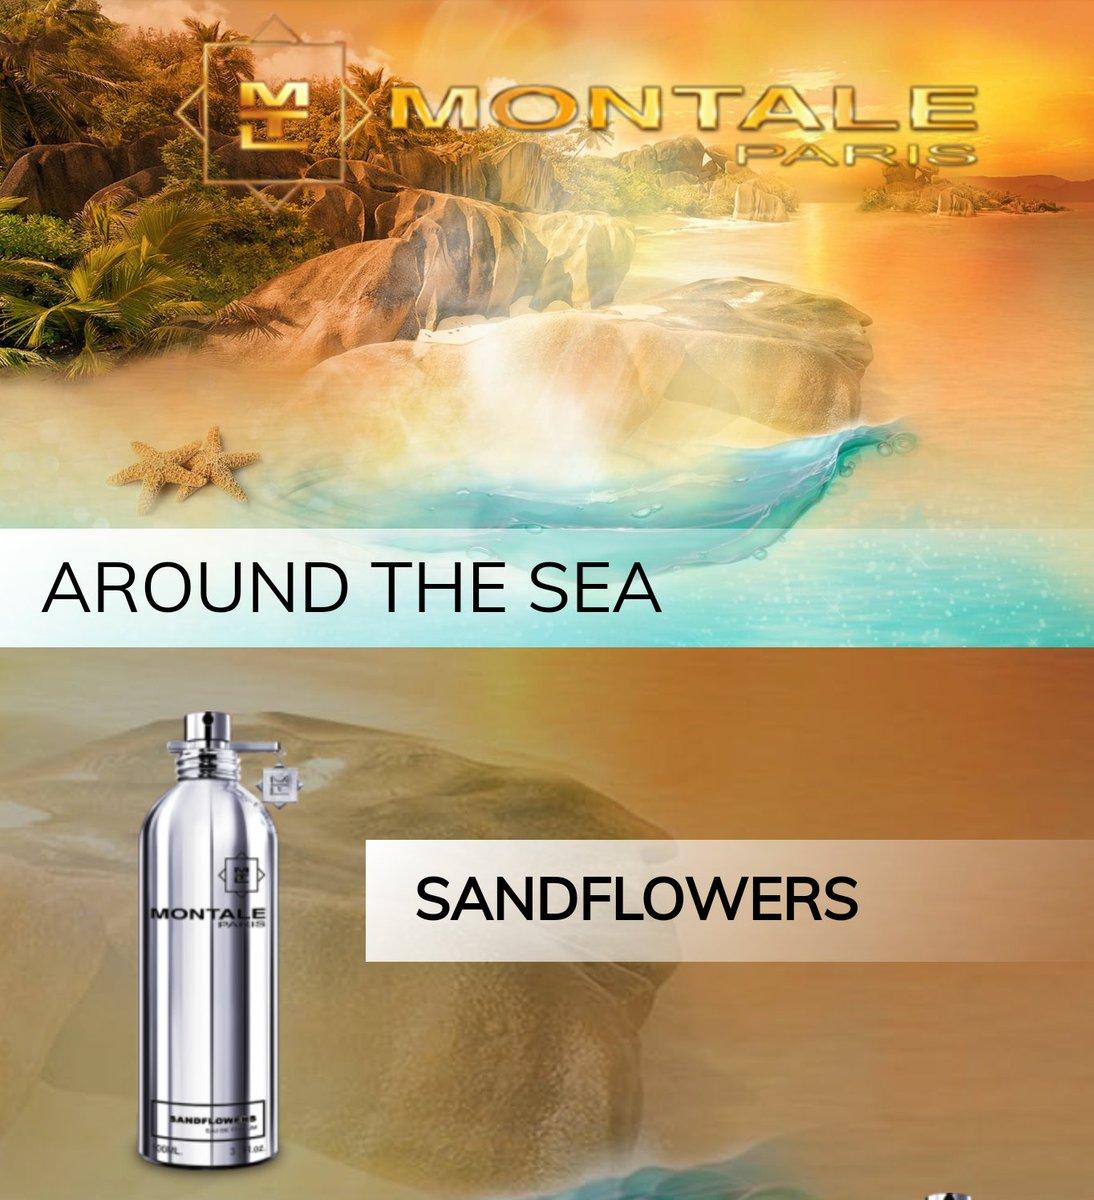 Montale Sandflowers